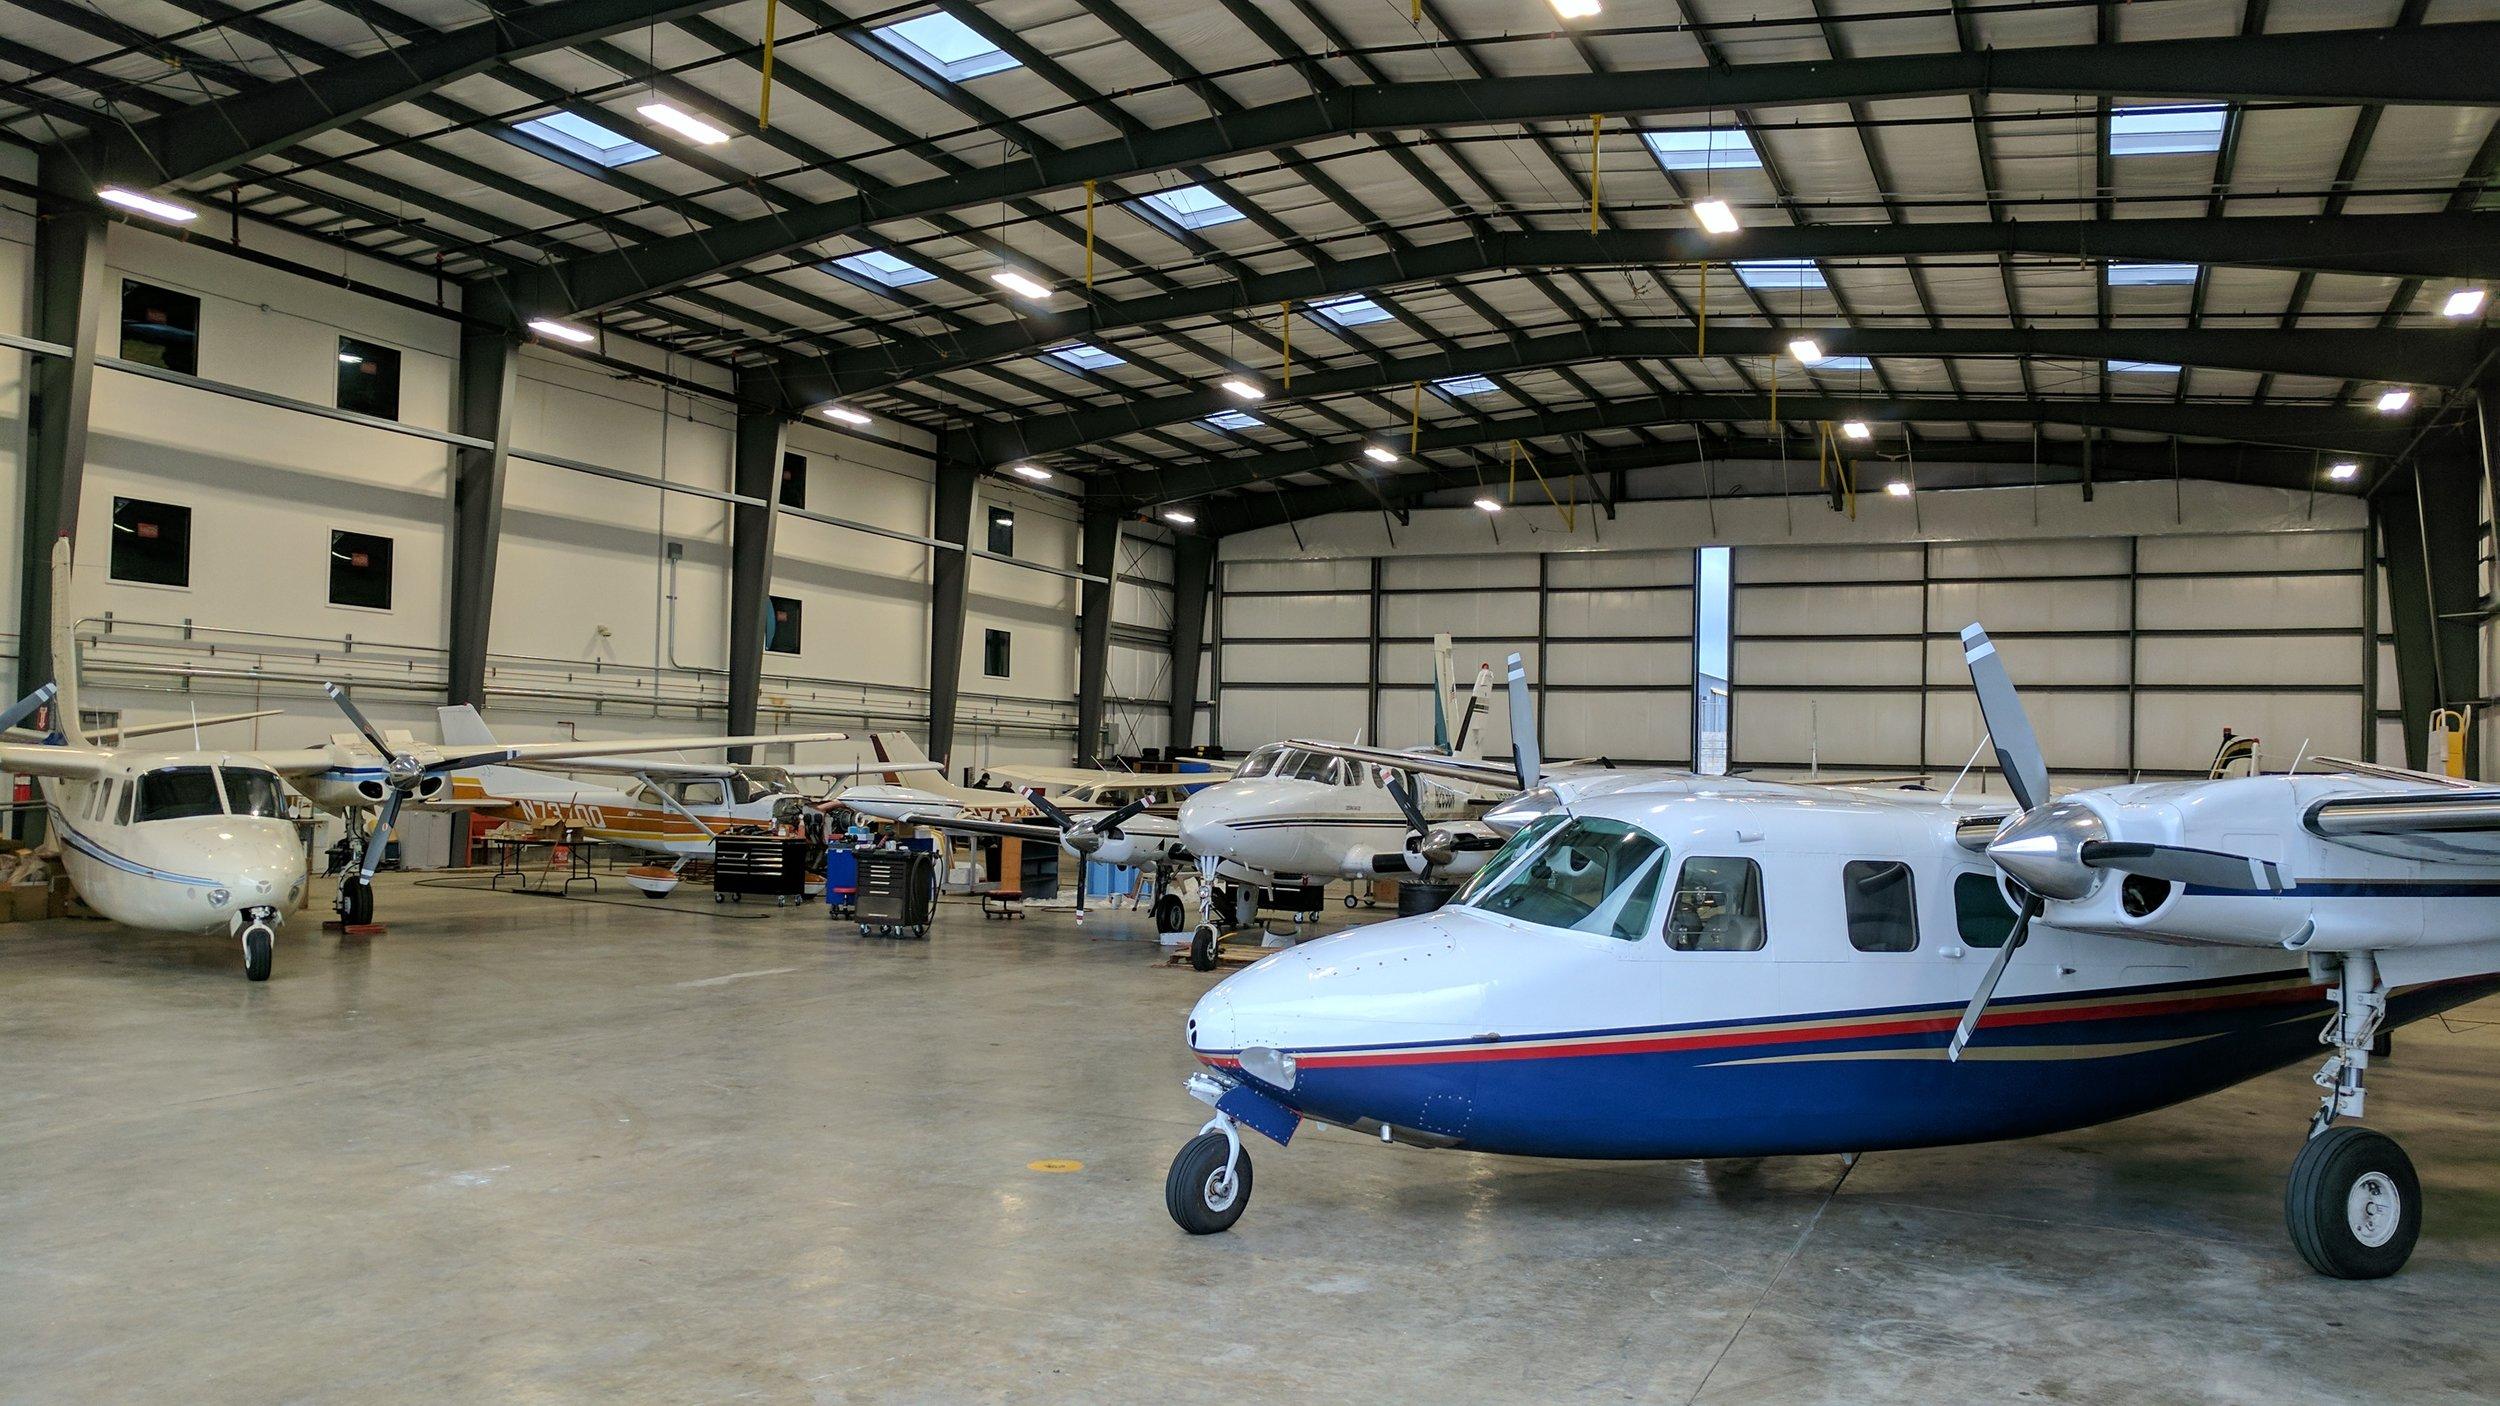 Our new maintenance hangar on 835 airport drive, san luis Obispo